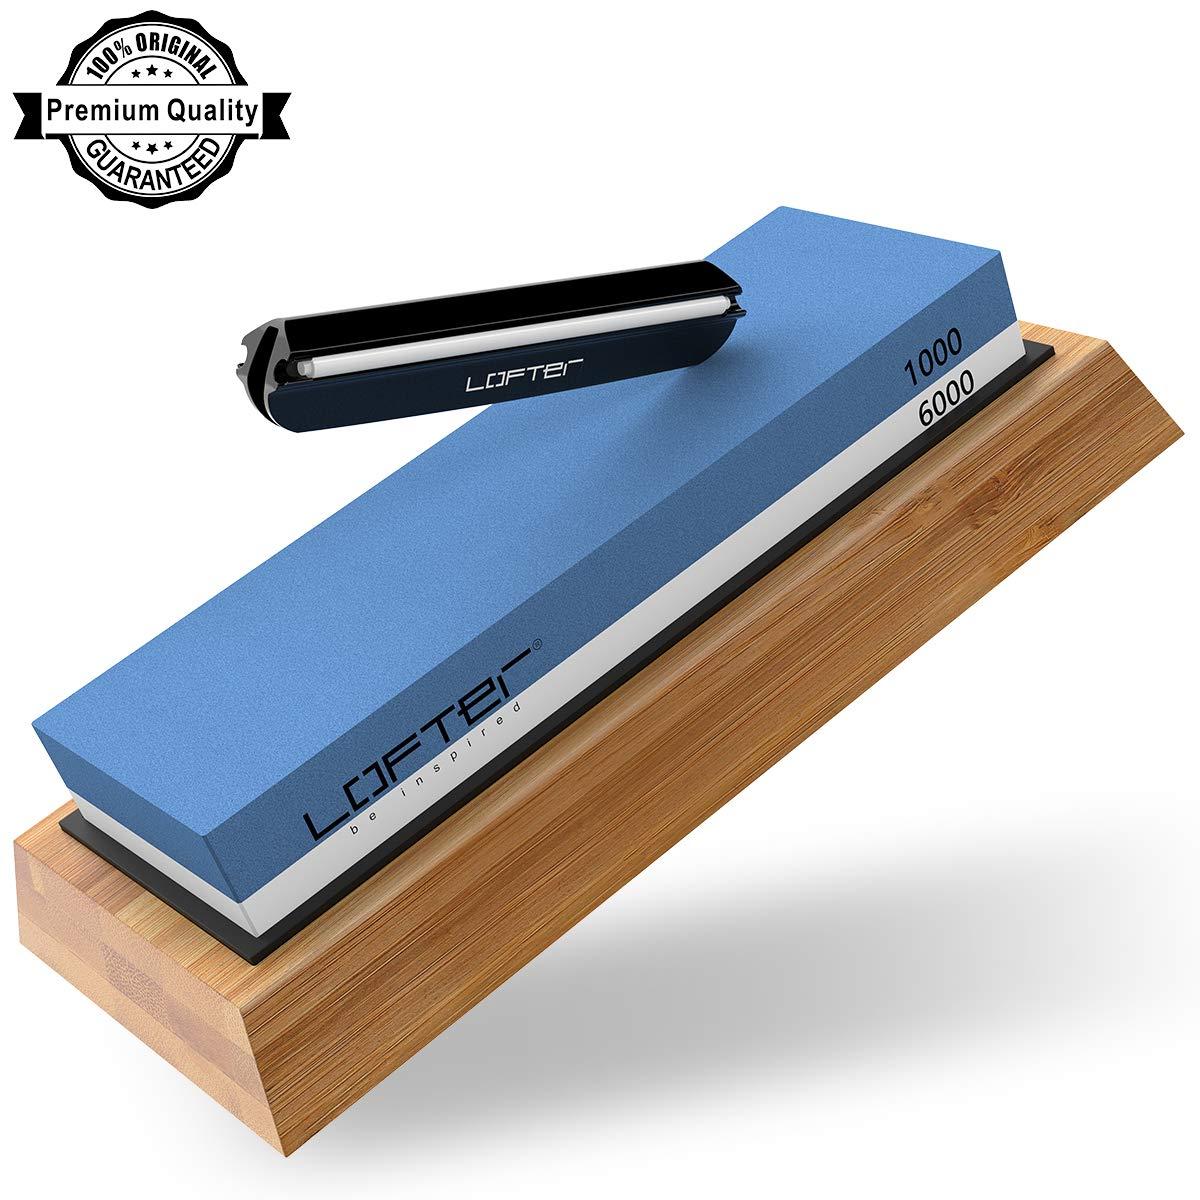 Knife Sharpening Stone, LOFTER Professional Knife Sharpener 1000/6000 2 Side Grit Whetstone, Premium Waterstone Kit with Non-Slip Bamboo Base & Angle Guide, Best Wet Stone Kitchen knife Sharpening Kit by LOFTer